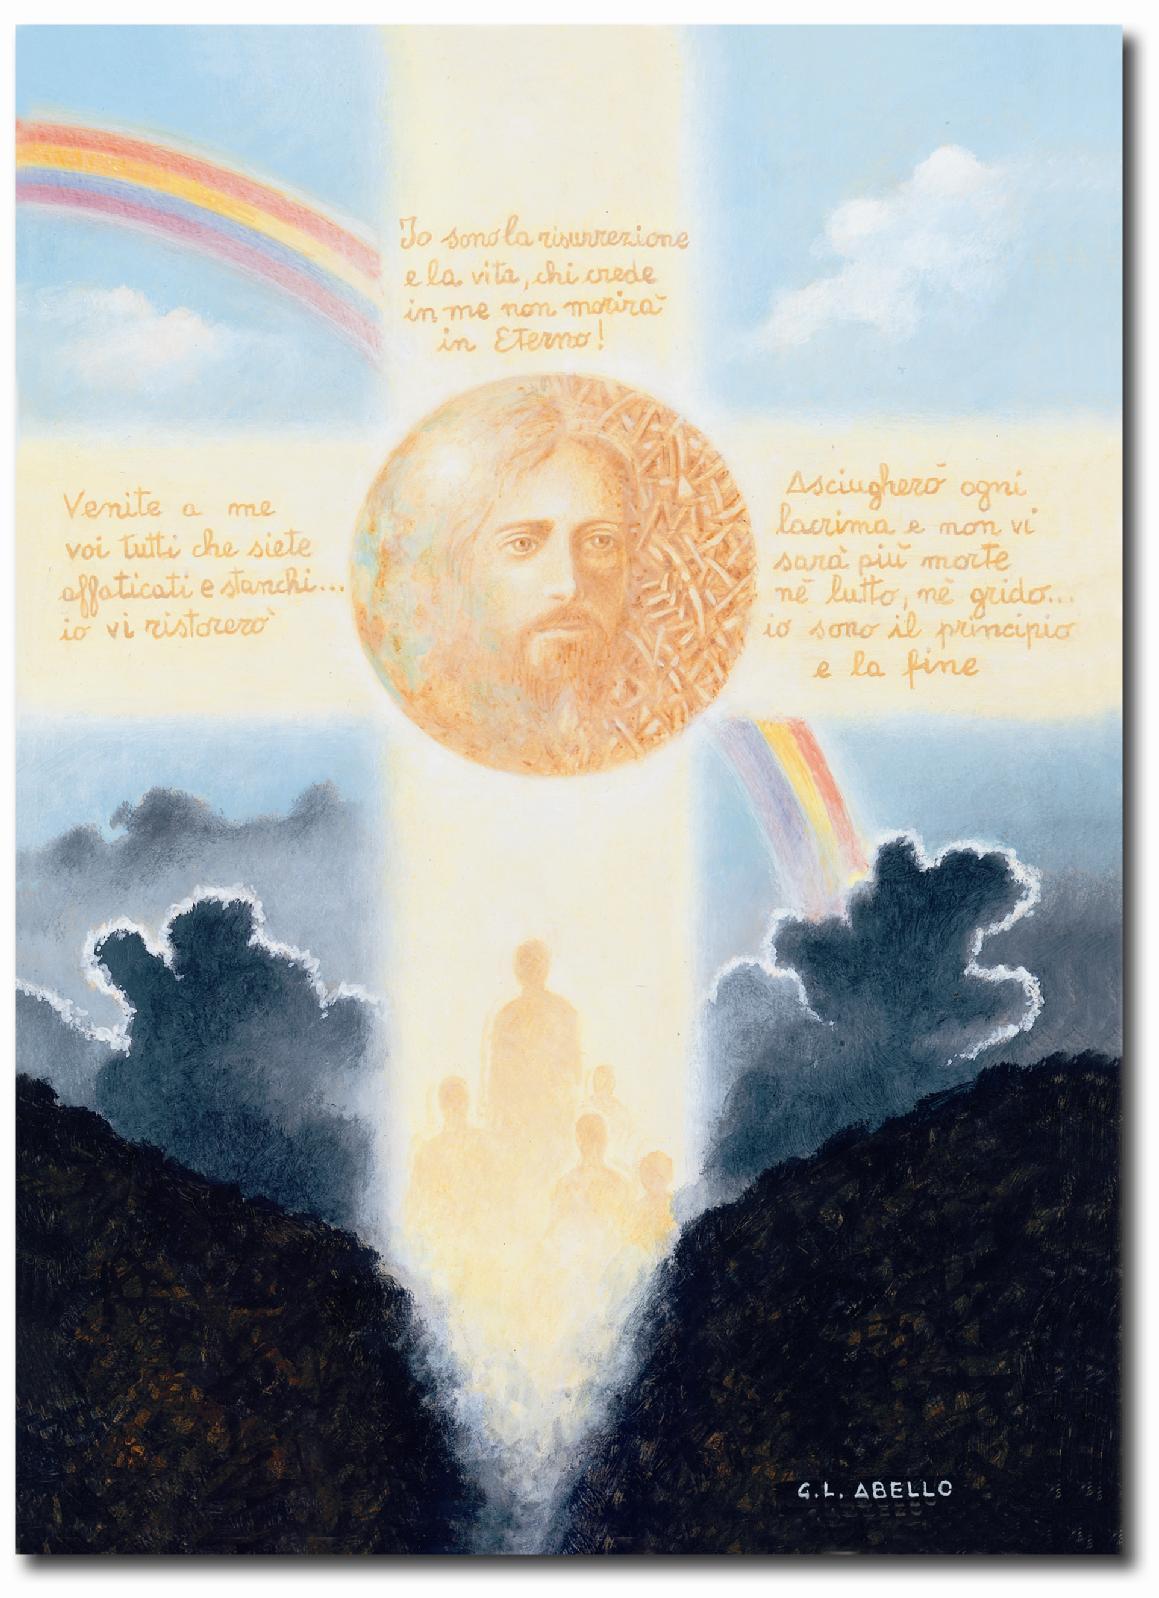 croce gloriosa light.JPG